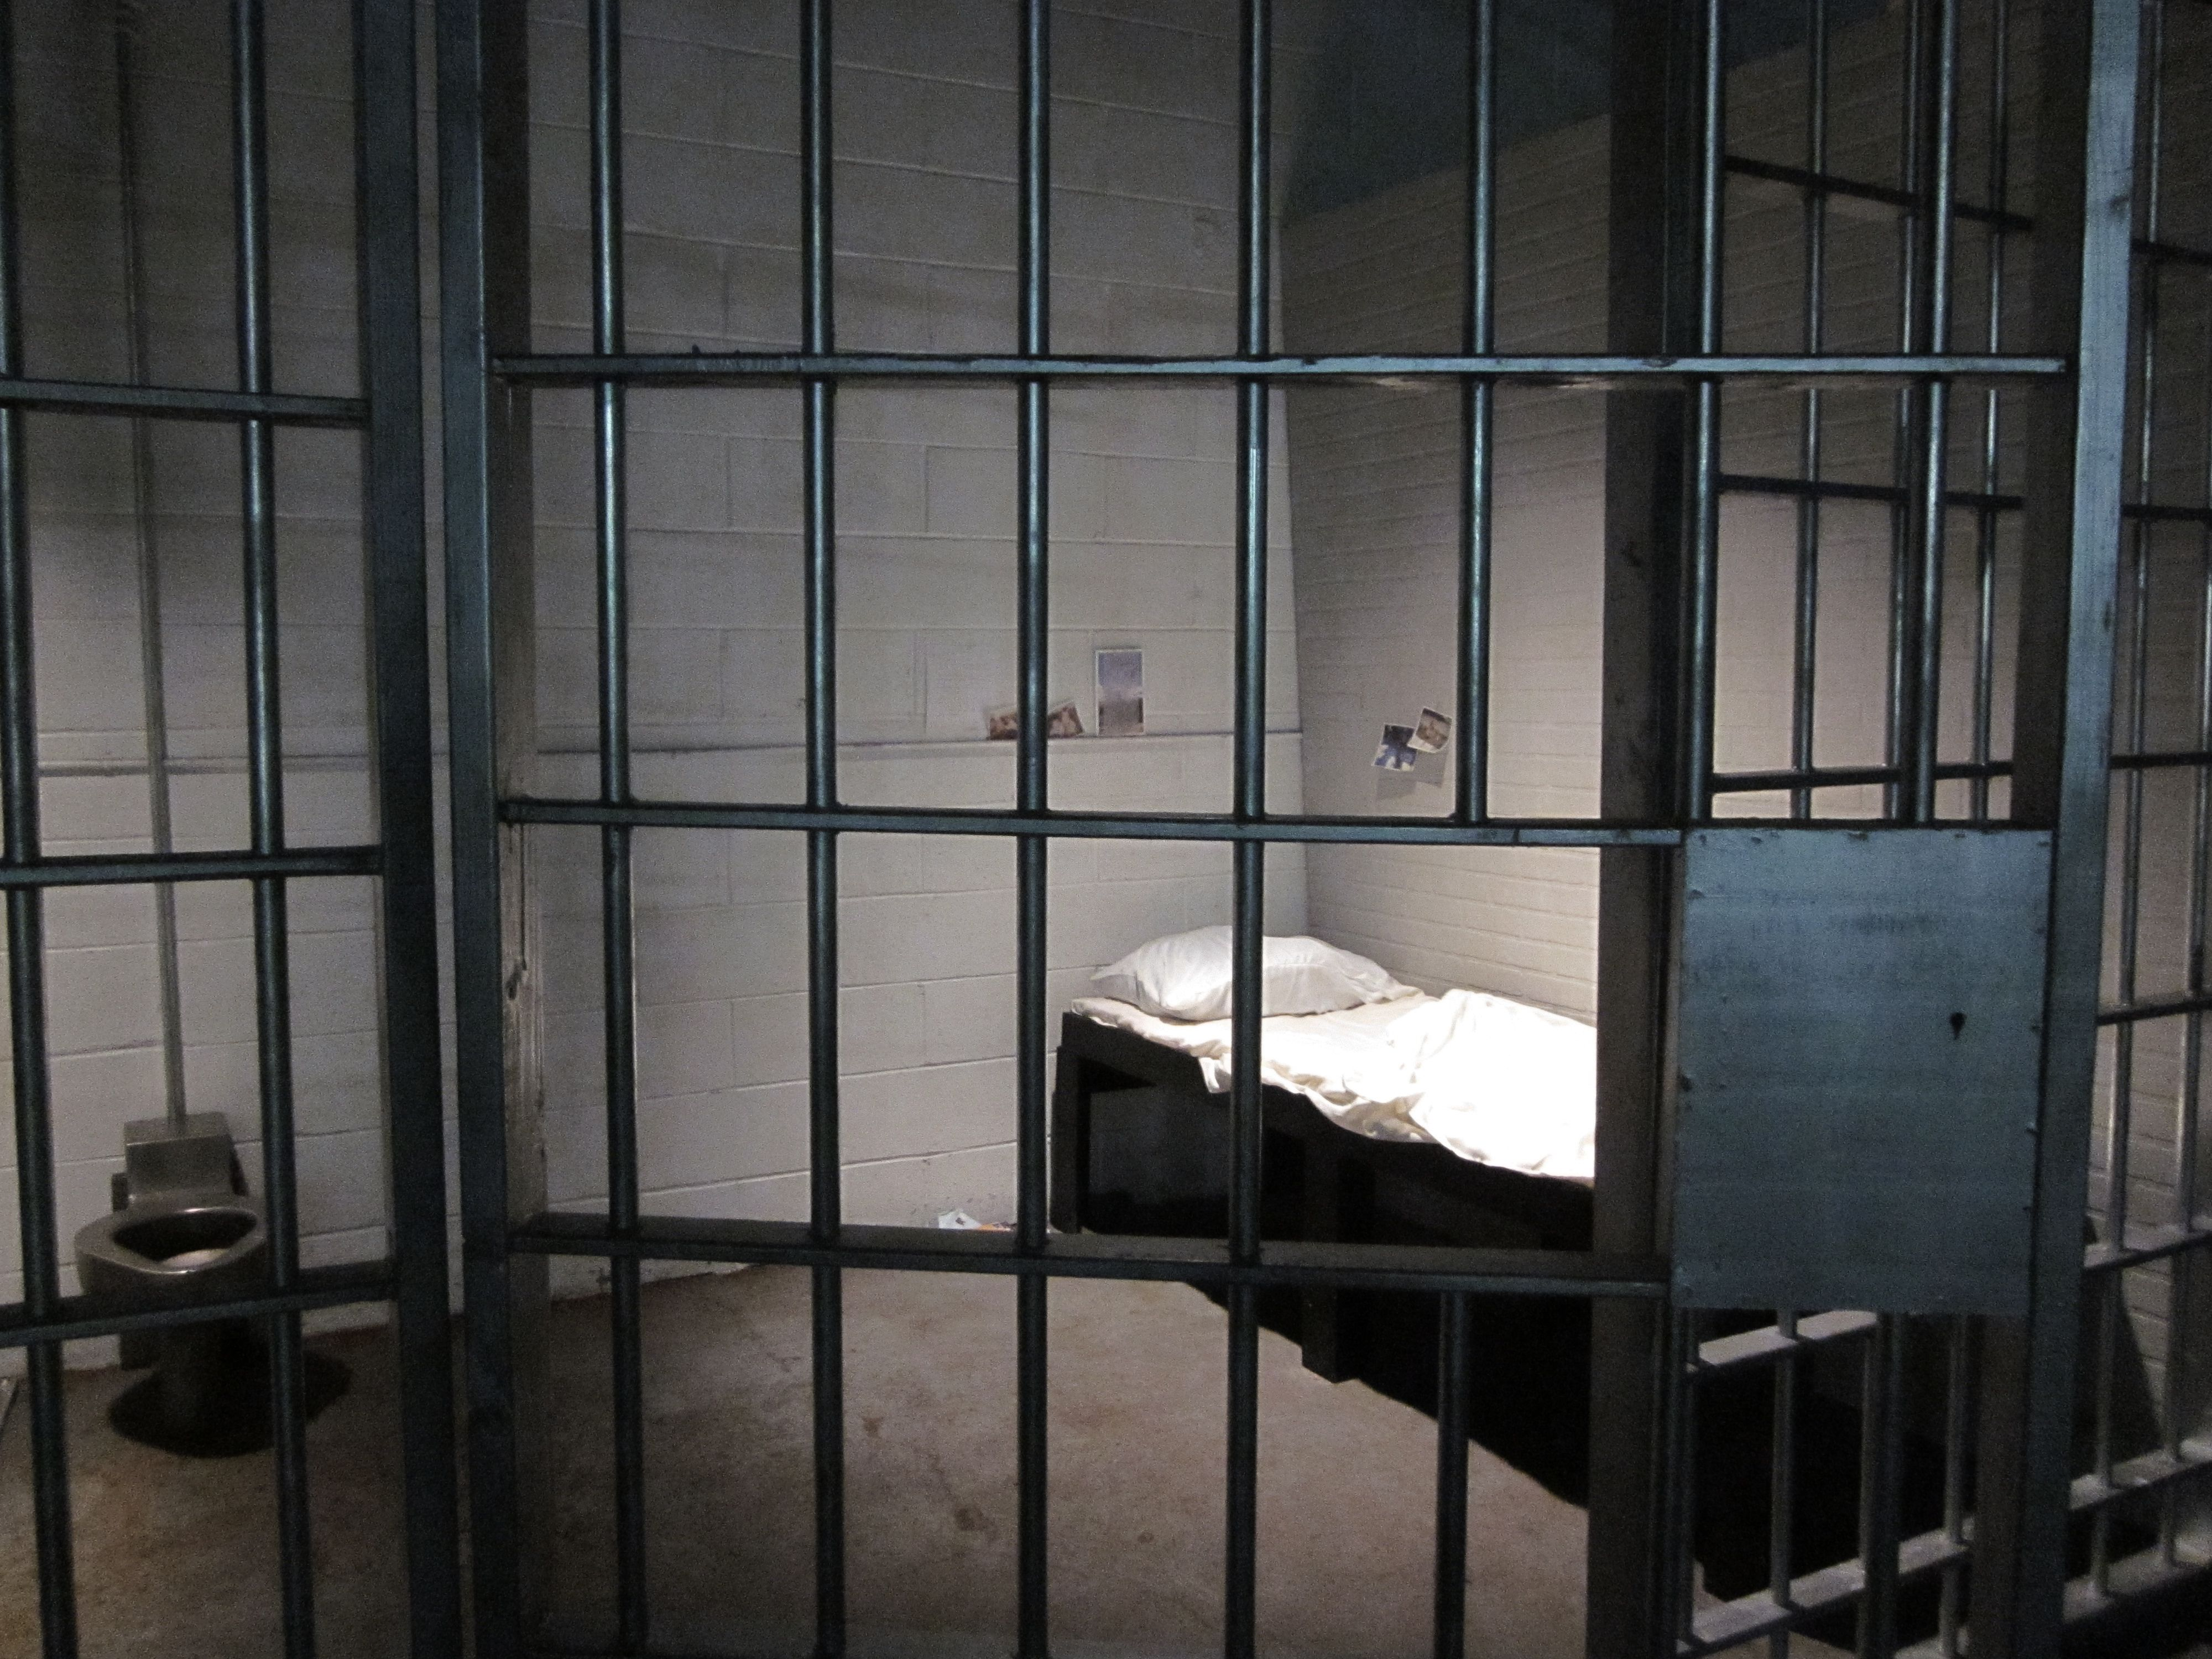 4000x3000 Image Result For Jail Cell Illustration Character Design